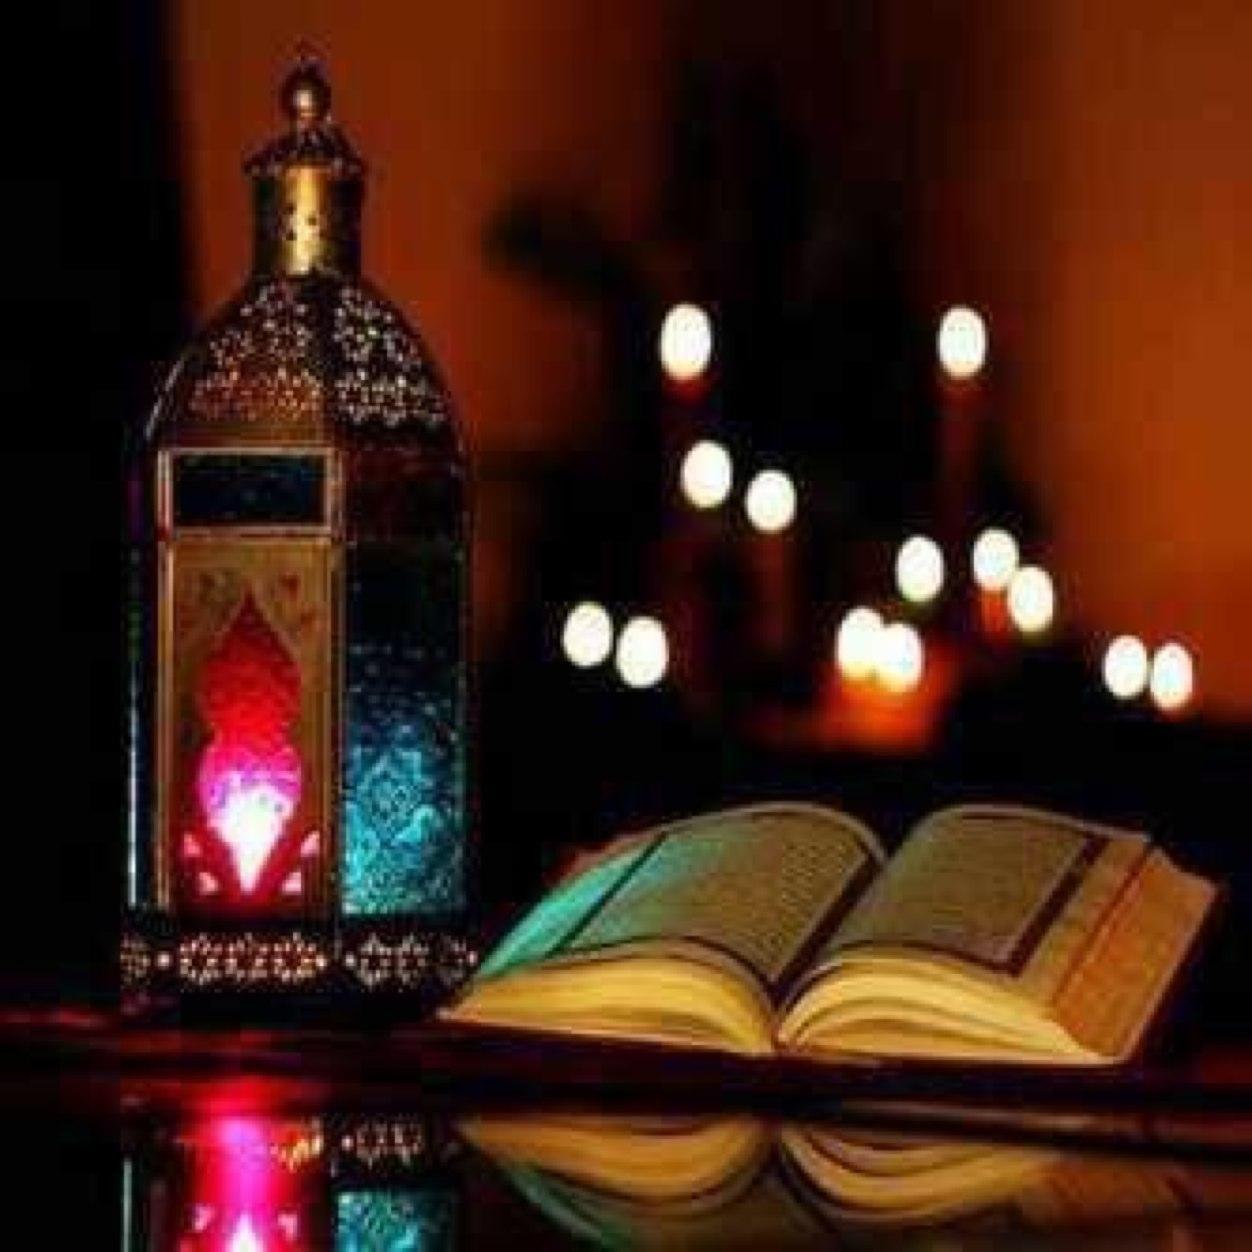 حالات واتس تهنئة بشهر رمضان 510026_dreambox-sat.